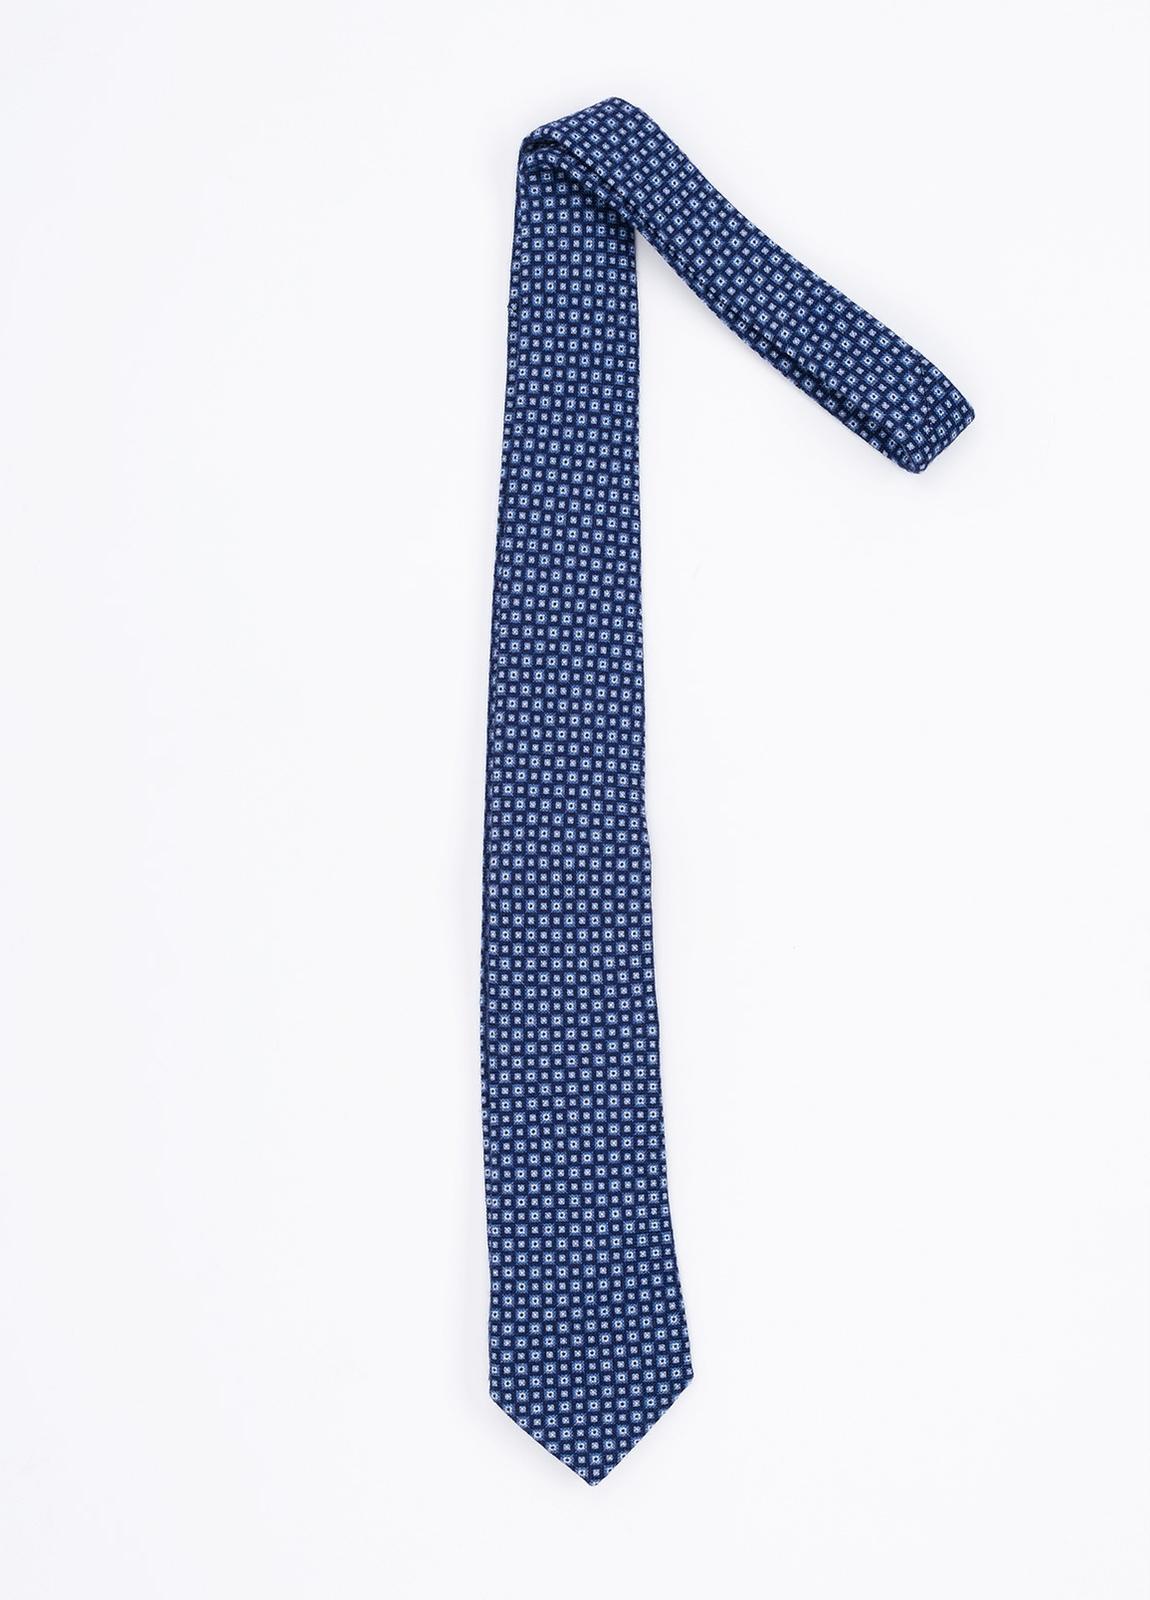 Corbata Formal Wear microdibujo, color azul. Pala 7,5 cm. 100% Lana.